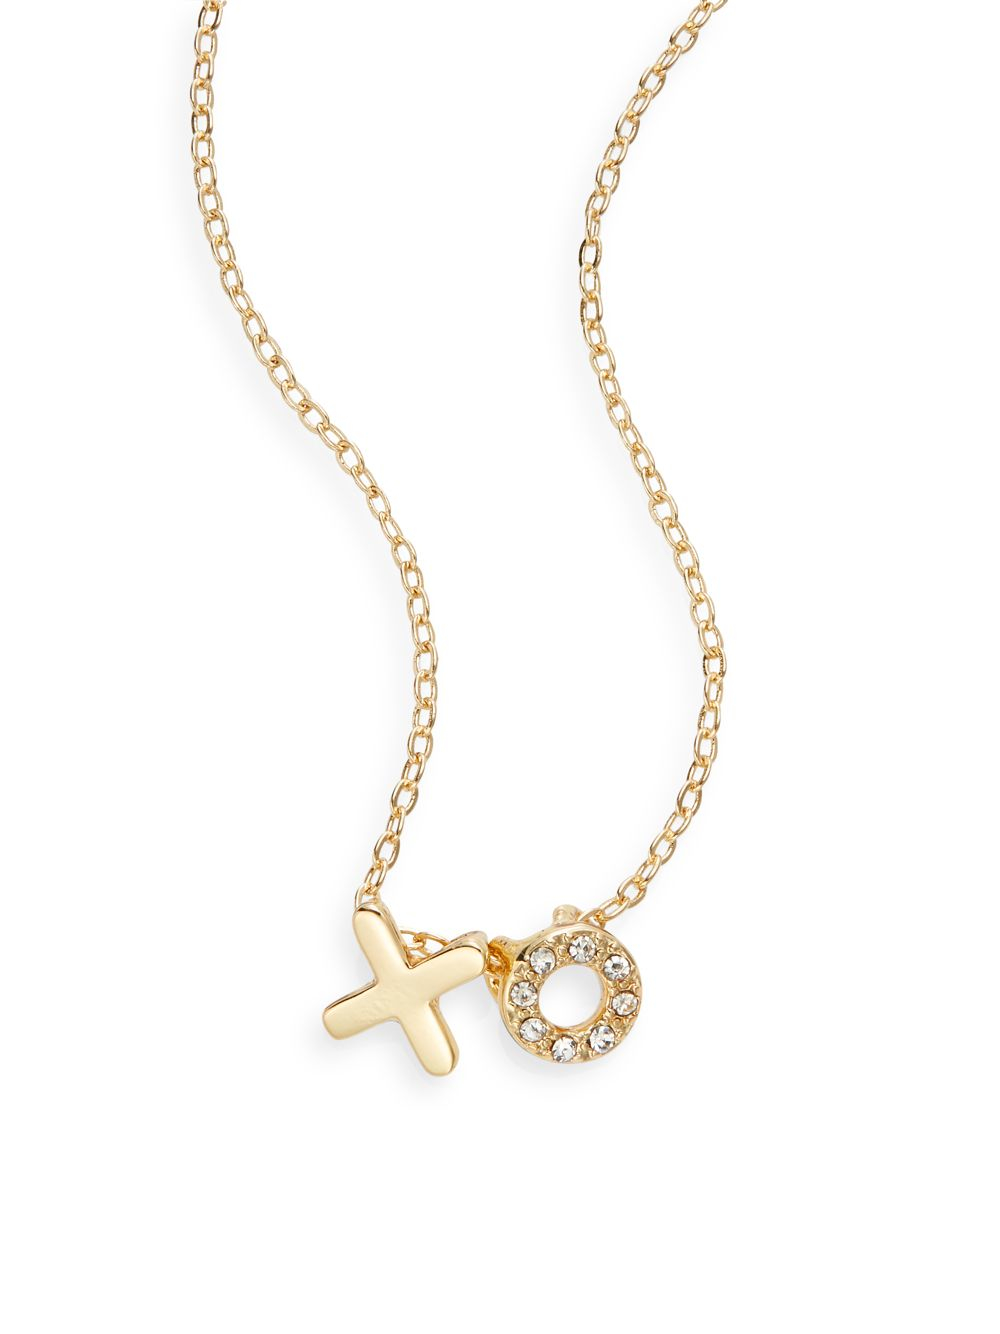 jules smith xo pendant necklace in metallic gold